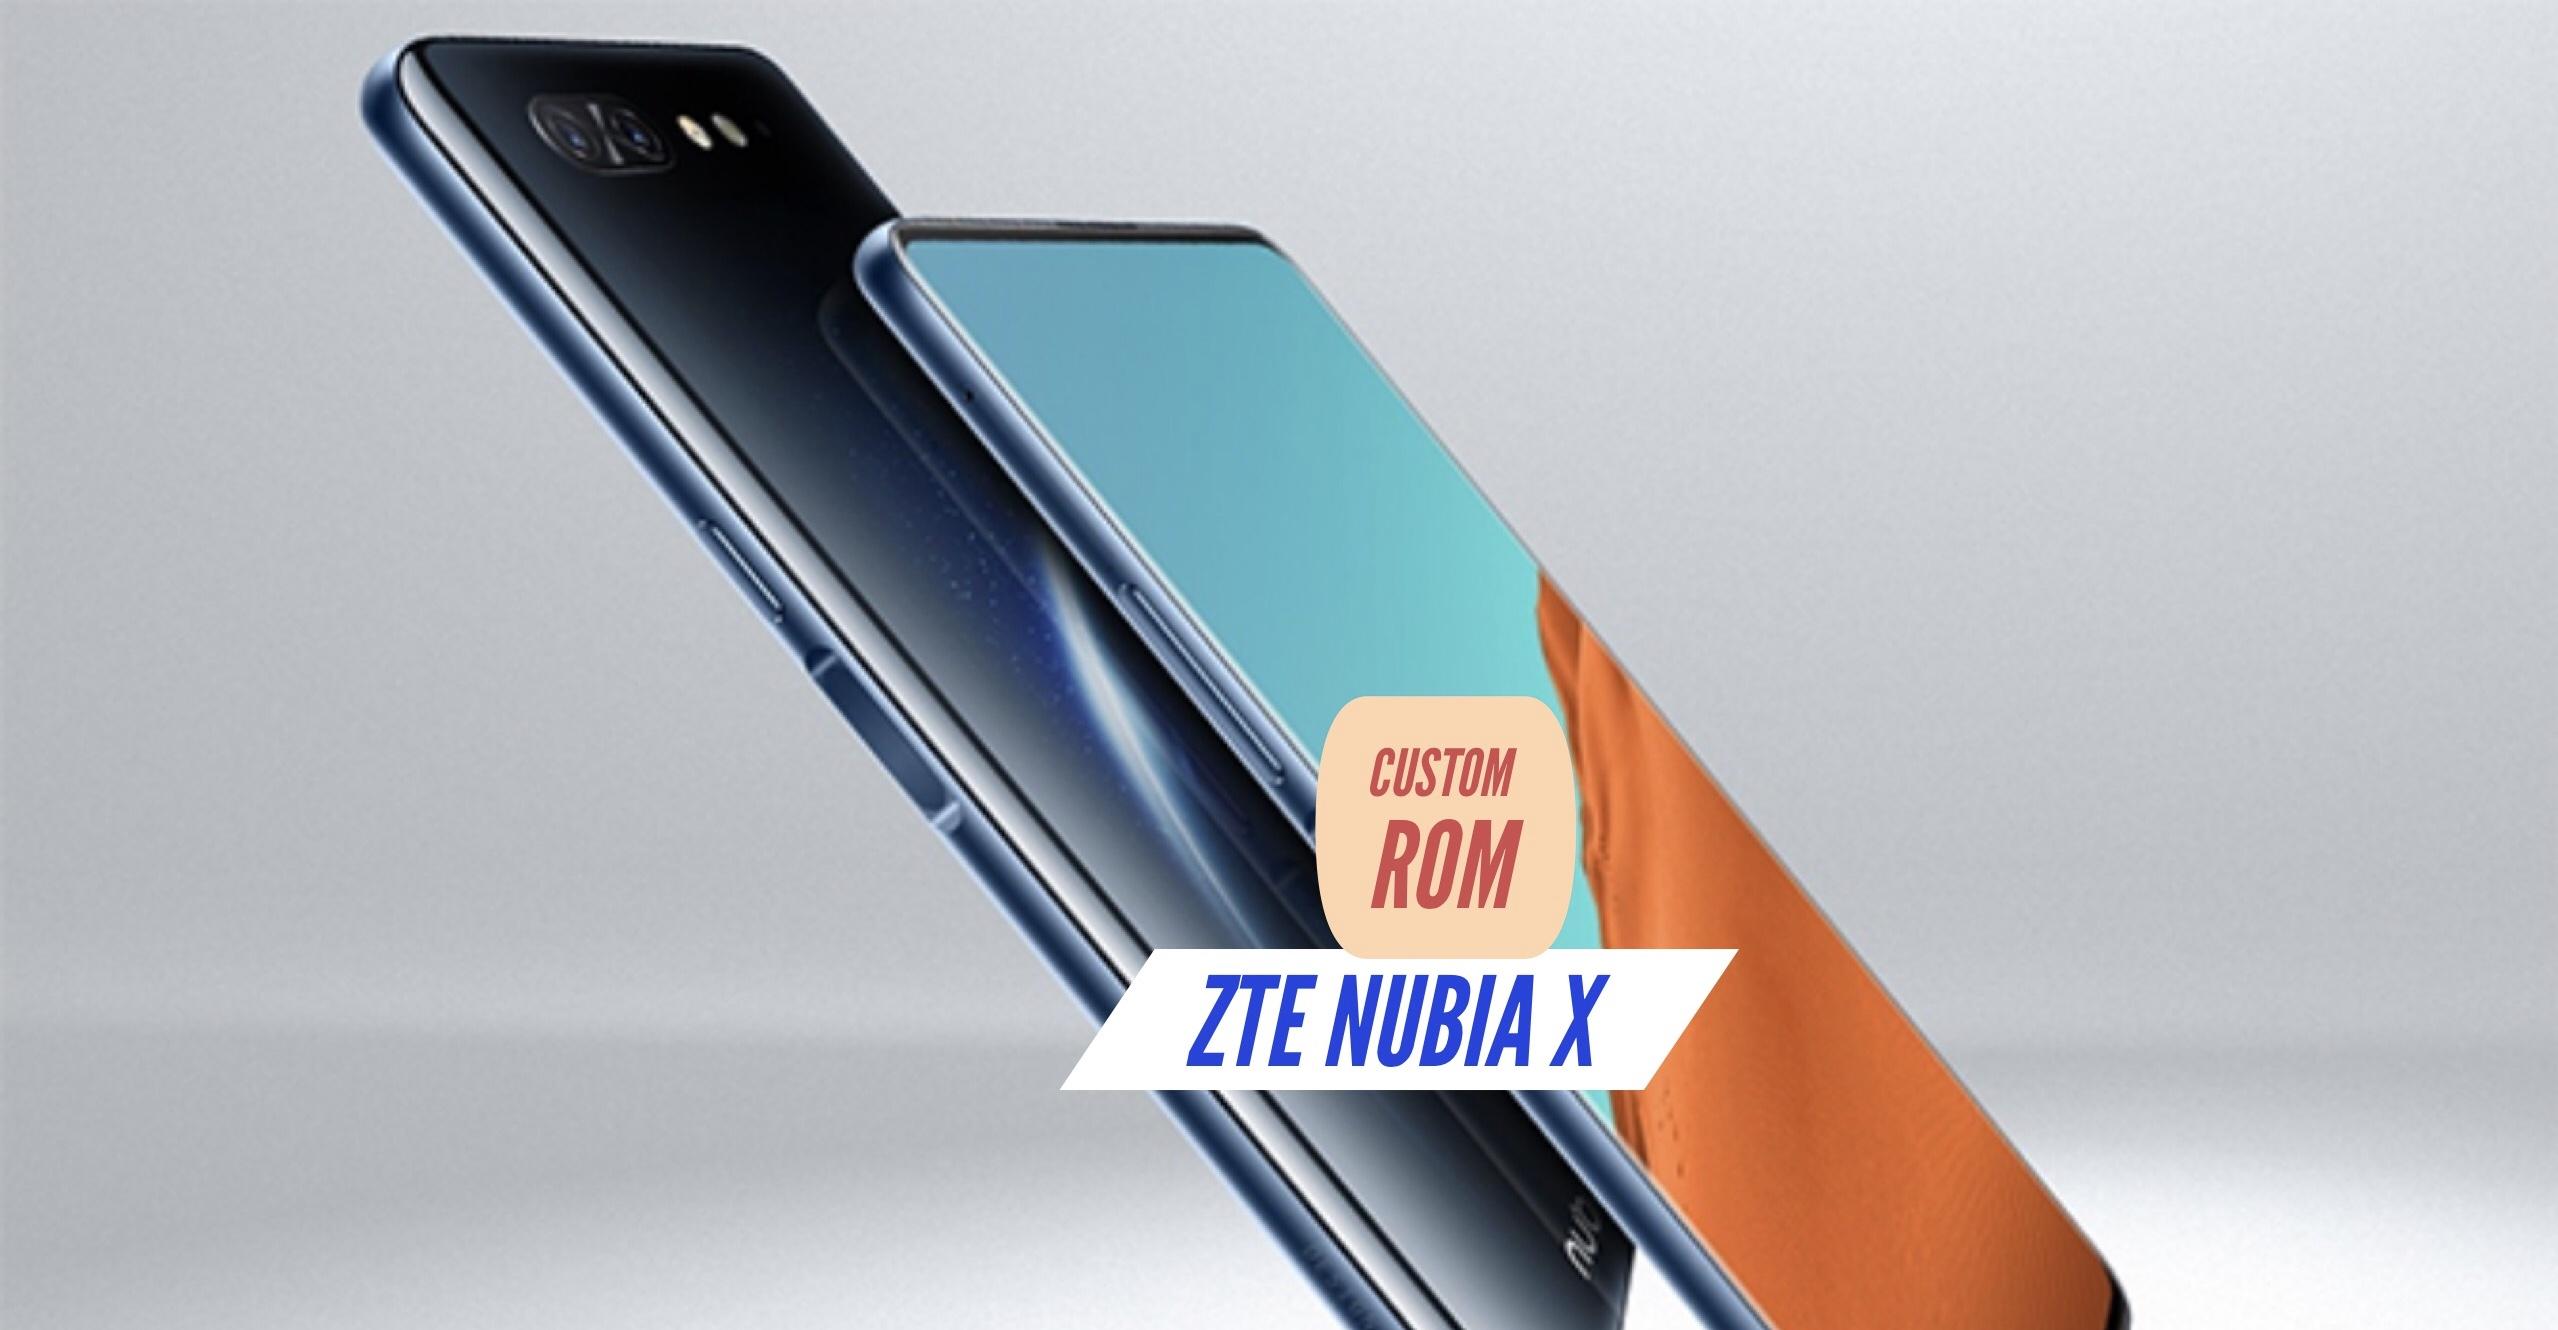 How to Install Custom ROM on ZTE Nubia X: CWM & TWRP!